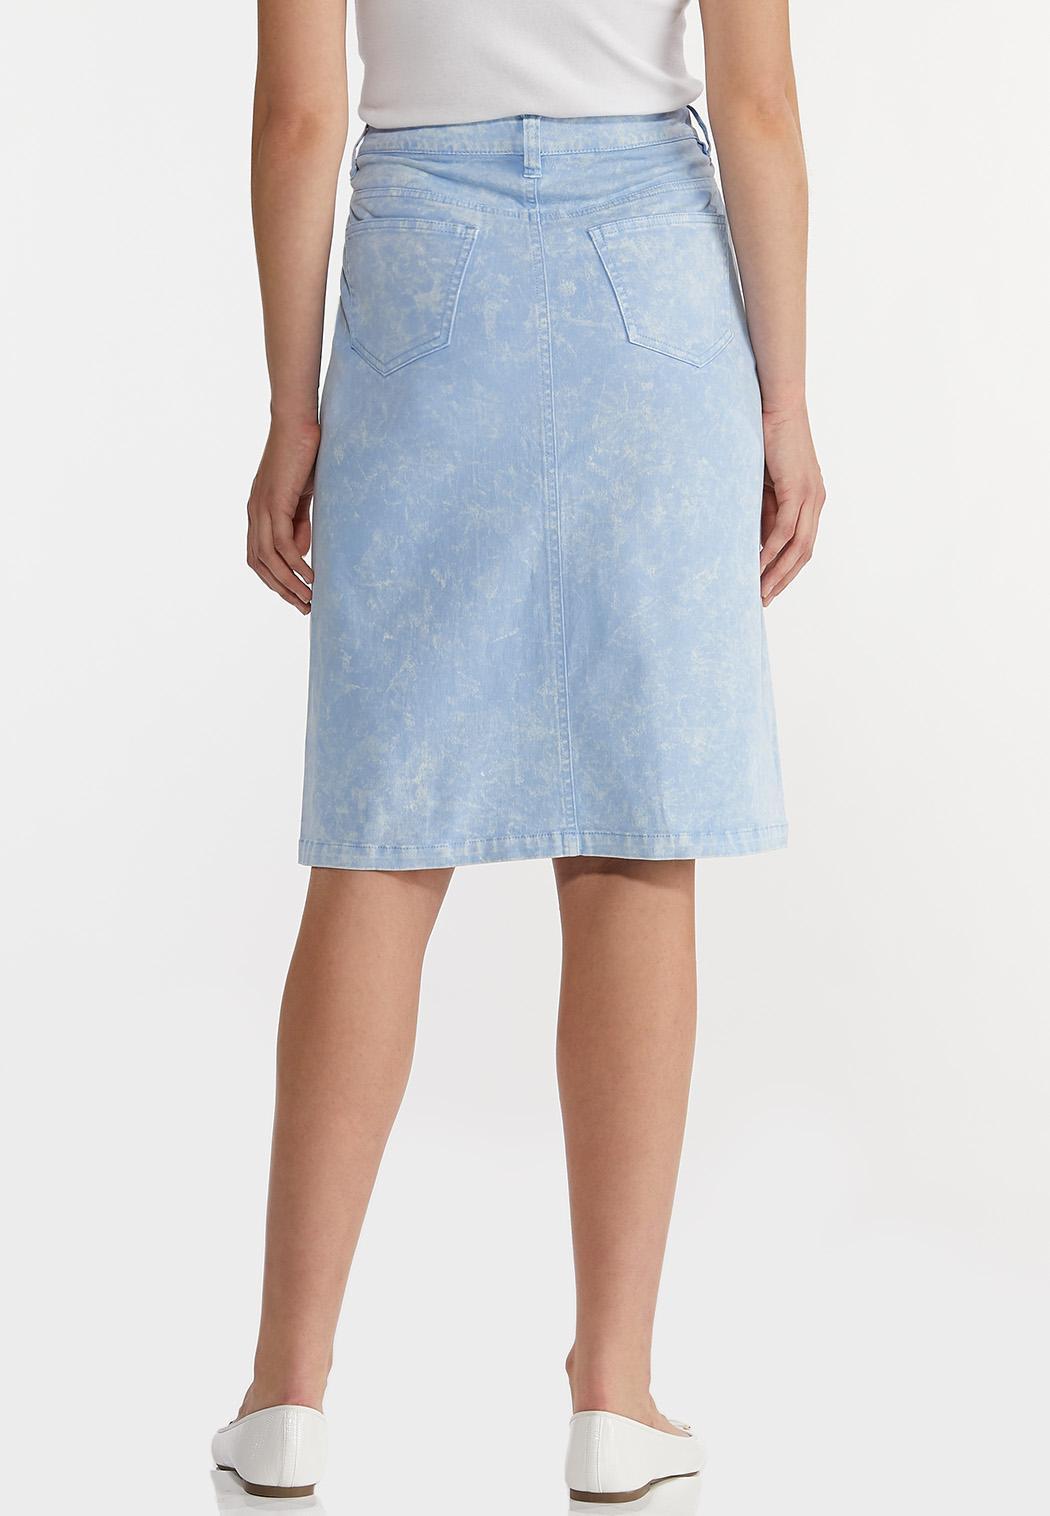 Sky Blue Denim Skirt (Item #44180348)